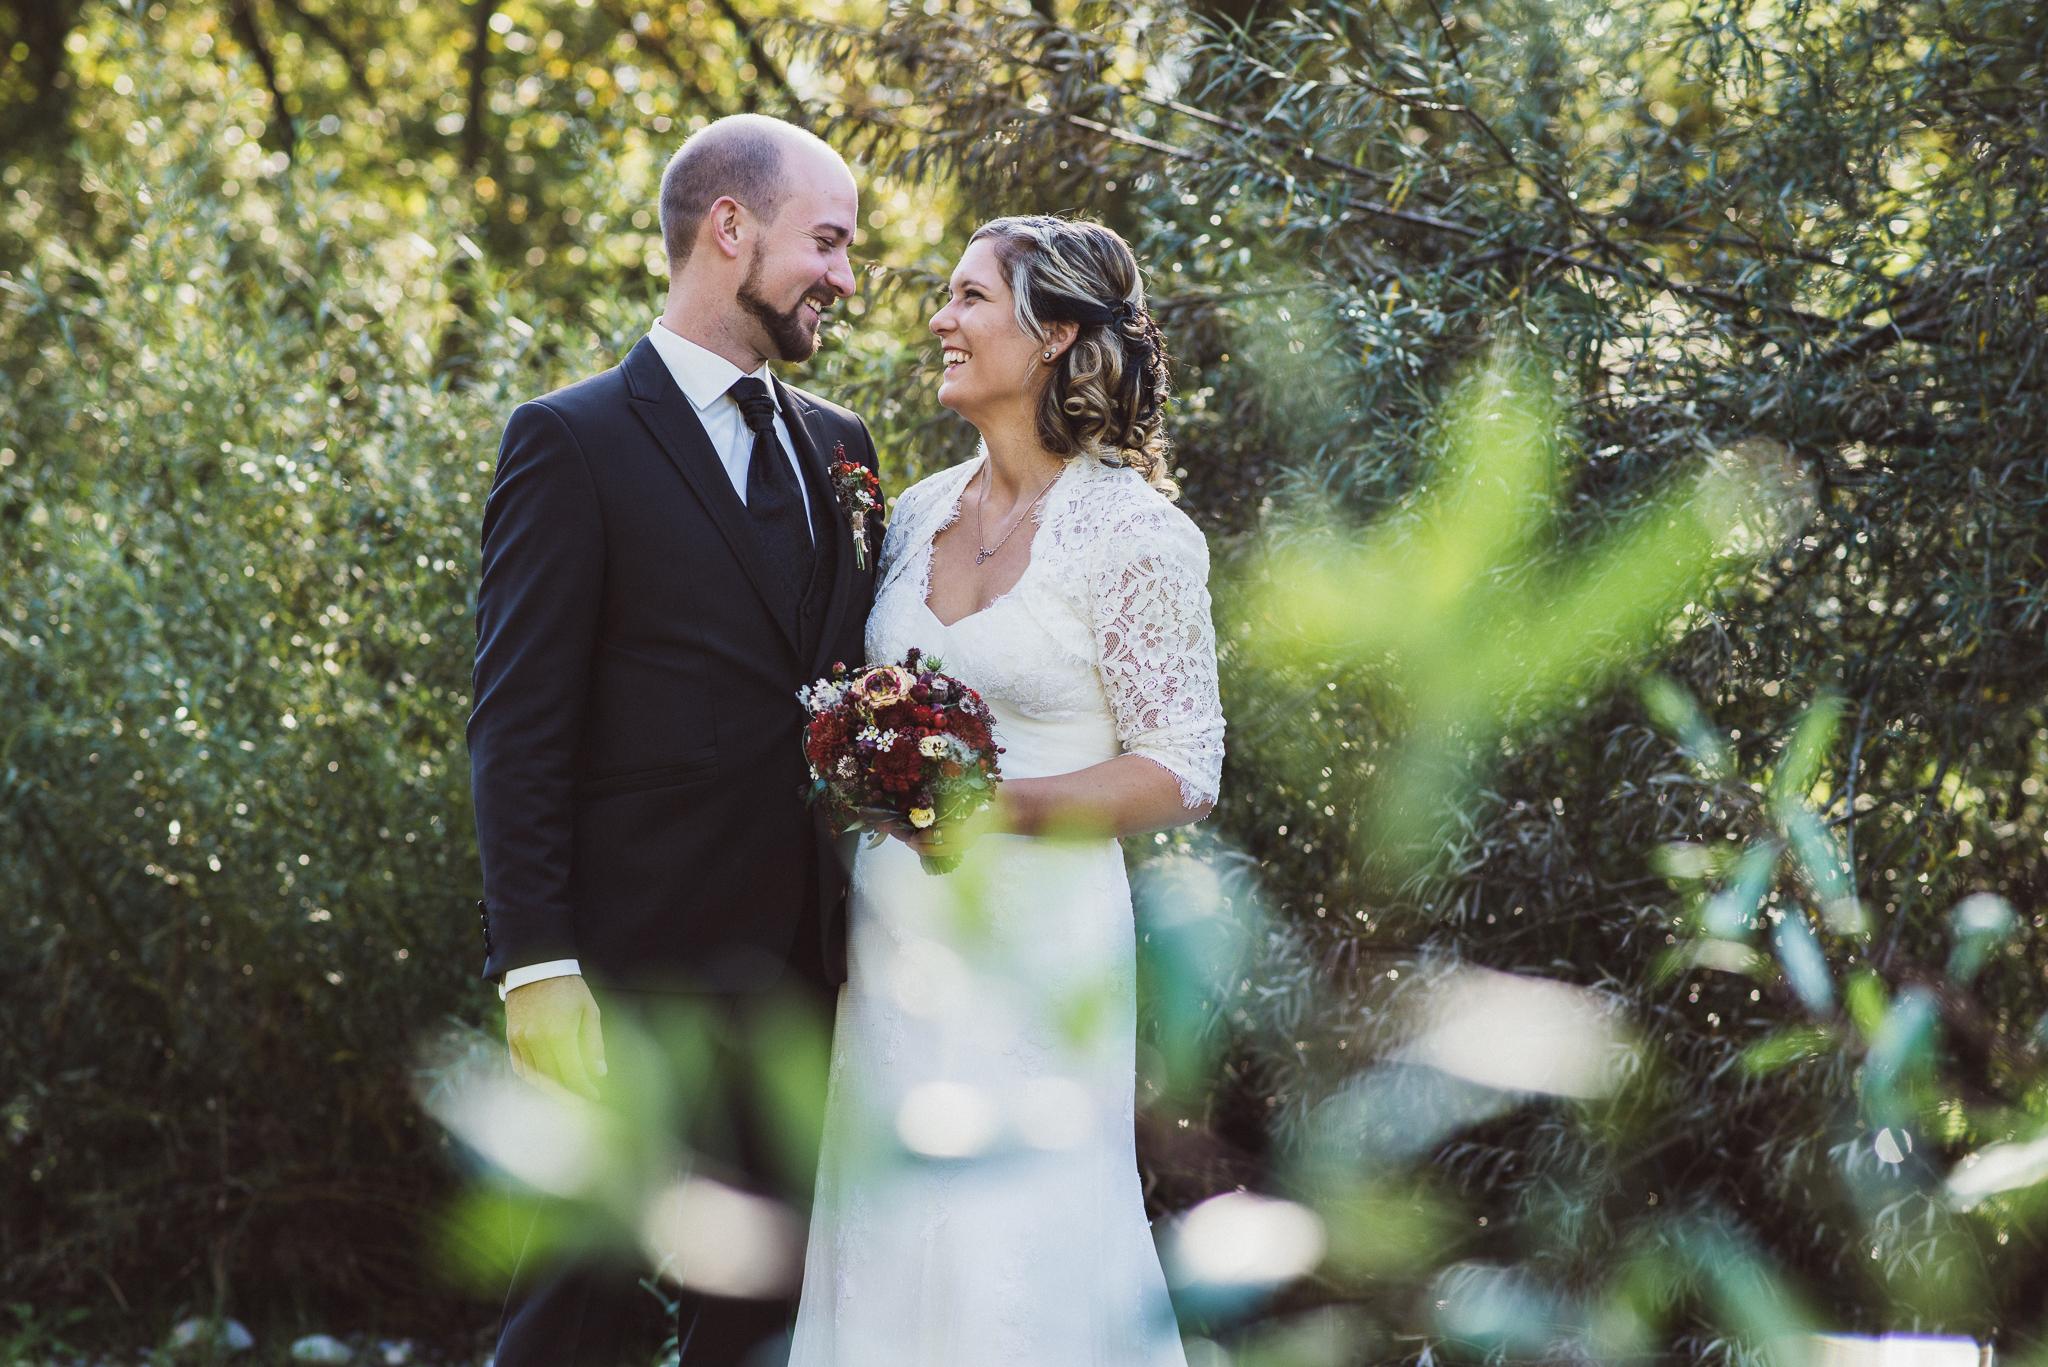 Daniela Huber, Hochzeitsfotograf